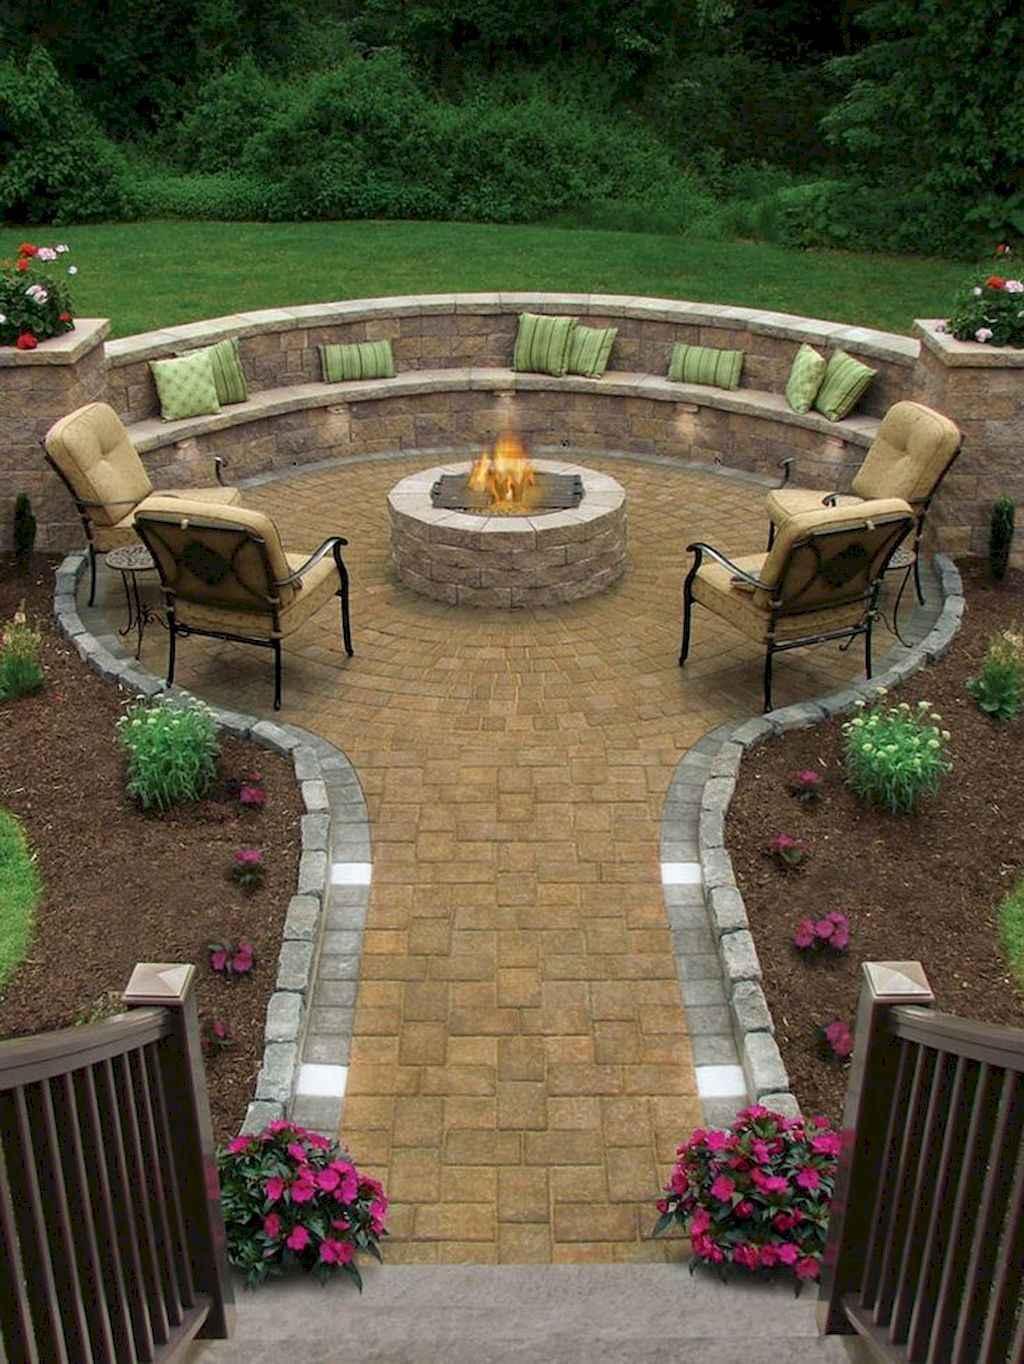 60 Beautiful Backyard Fire Pit Ideas Decoration and Remodel (49)